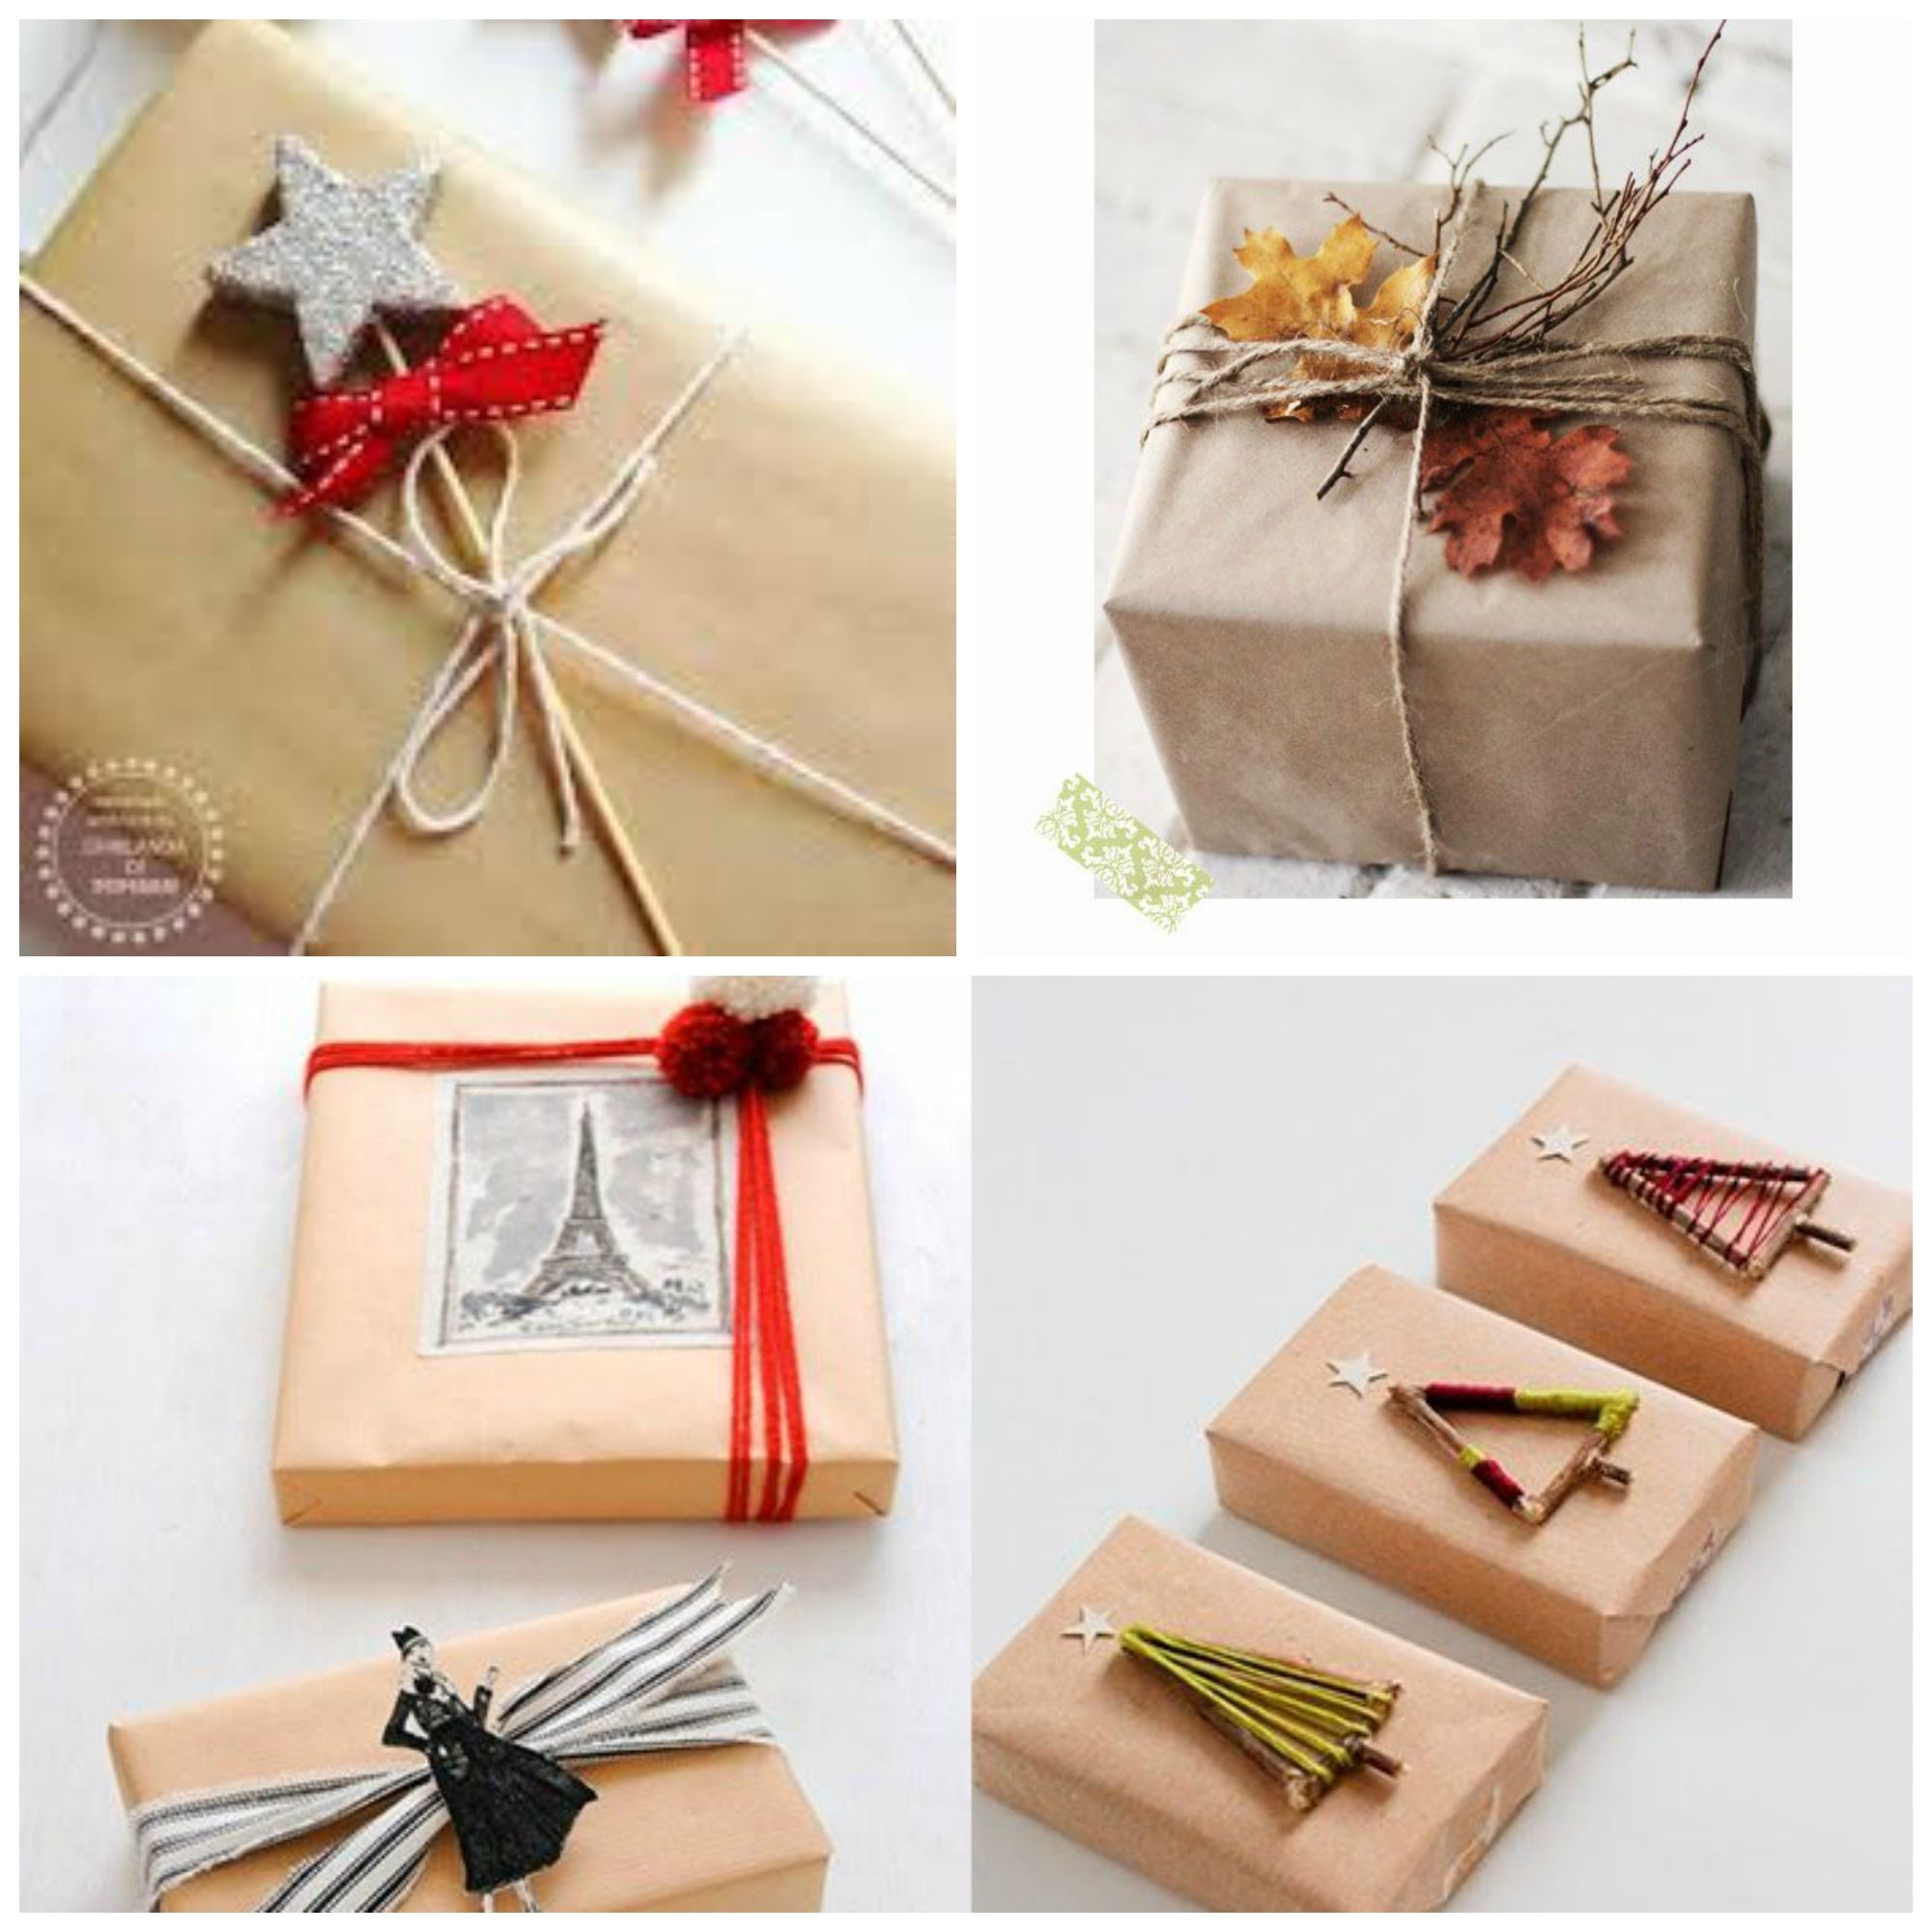 Como envolver regalos con papel craft buscar con google - Como envolver regalos de navidad originales ...